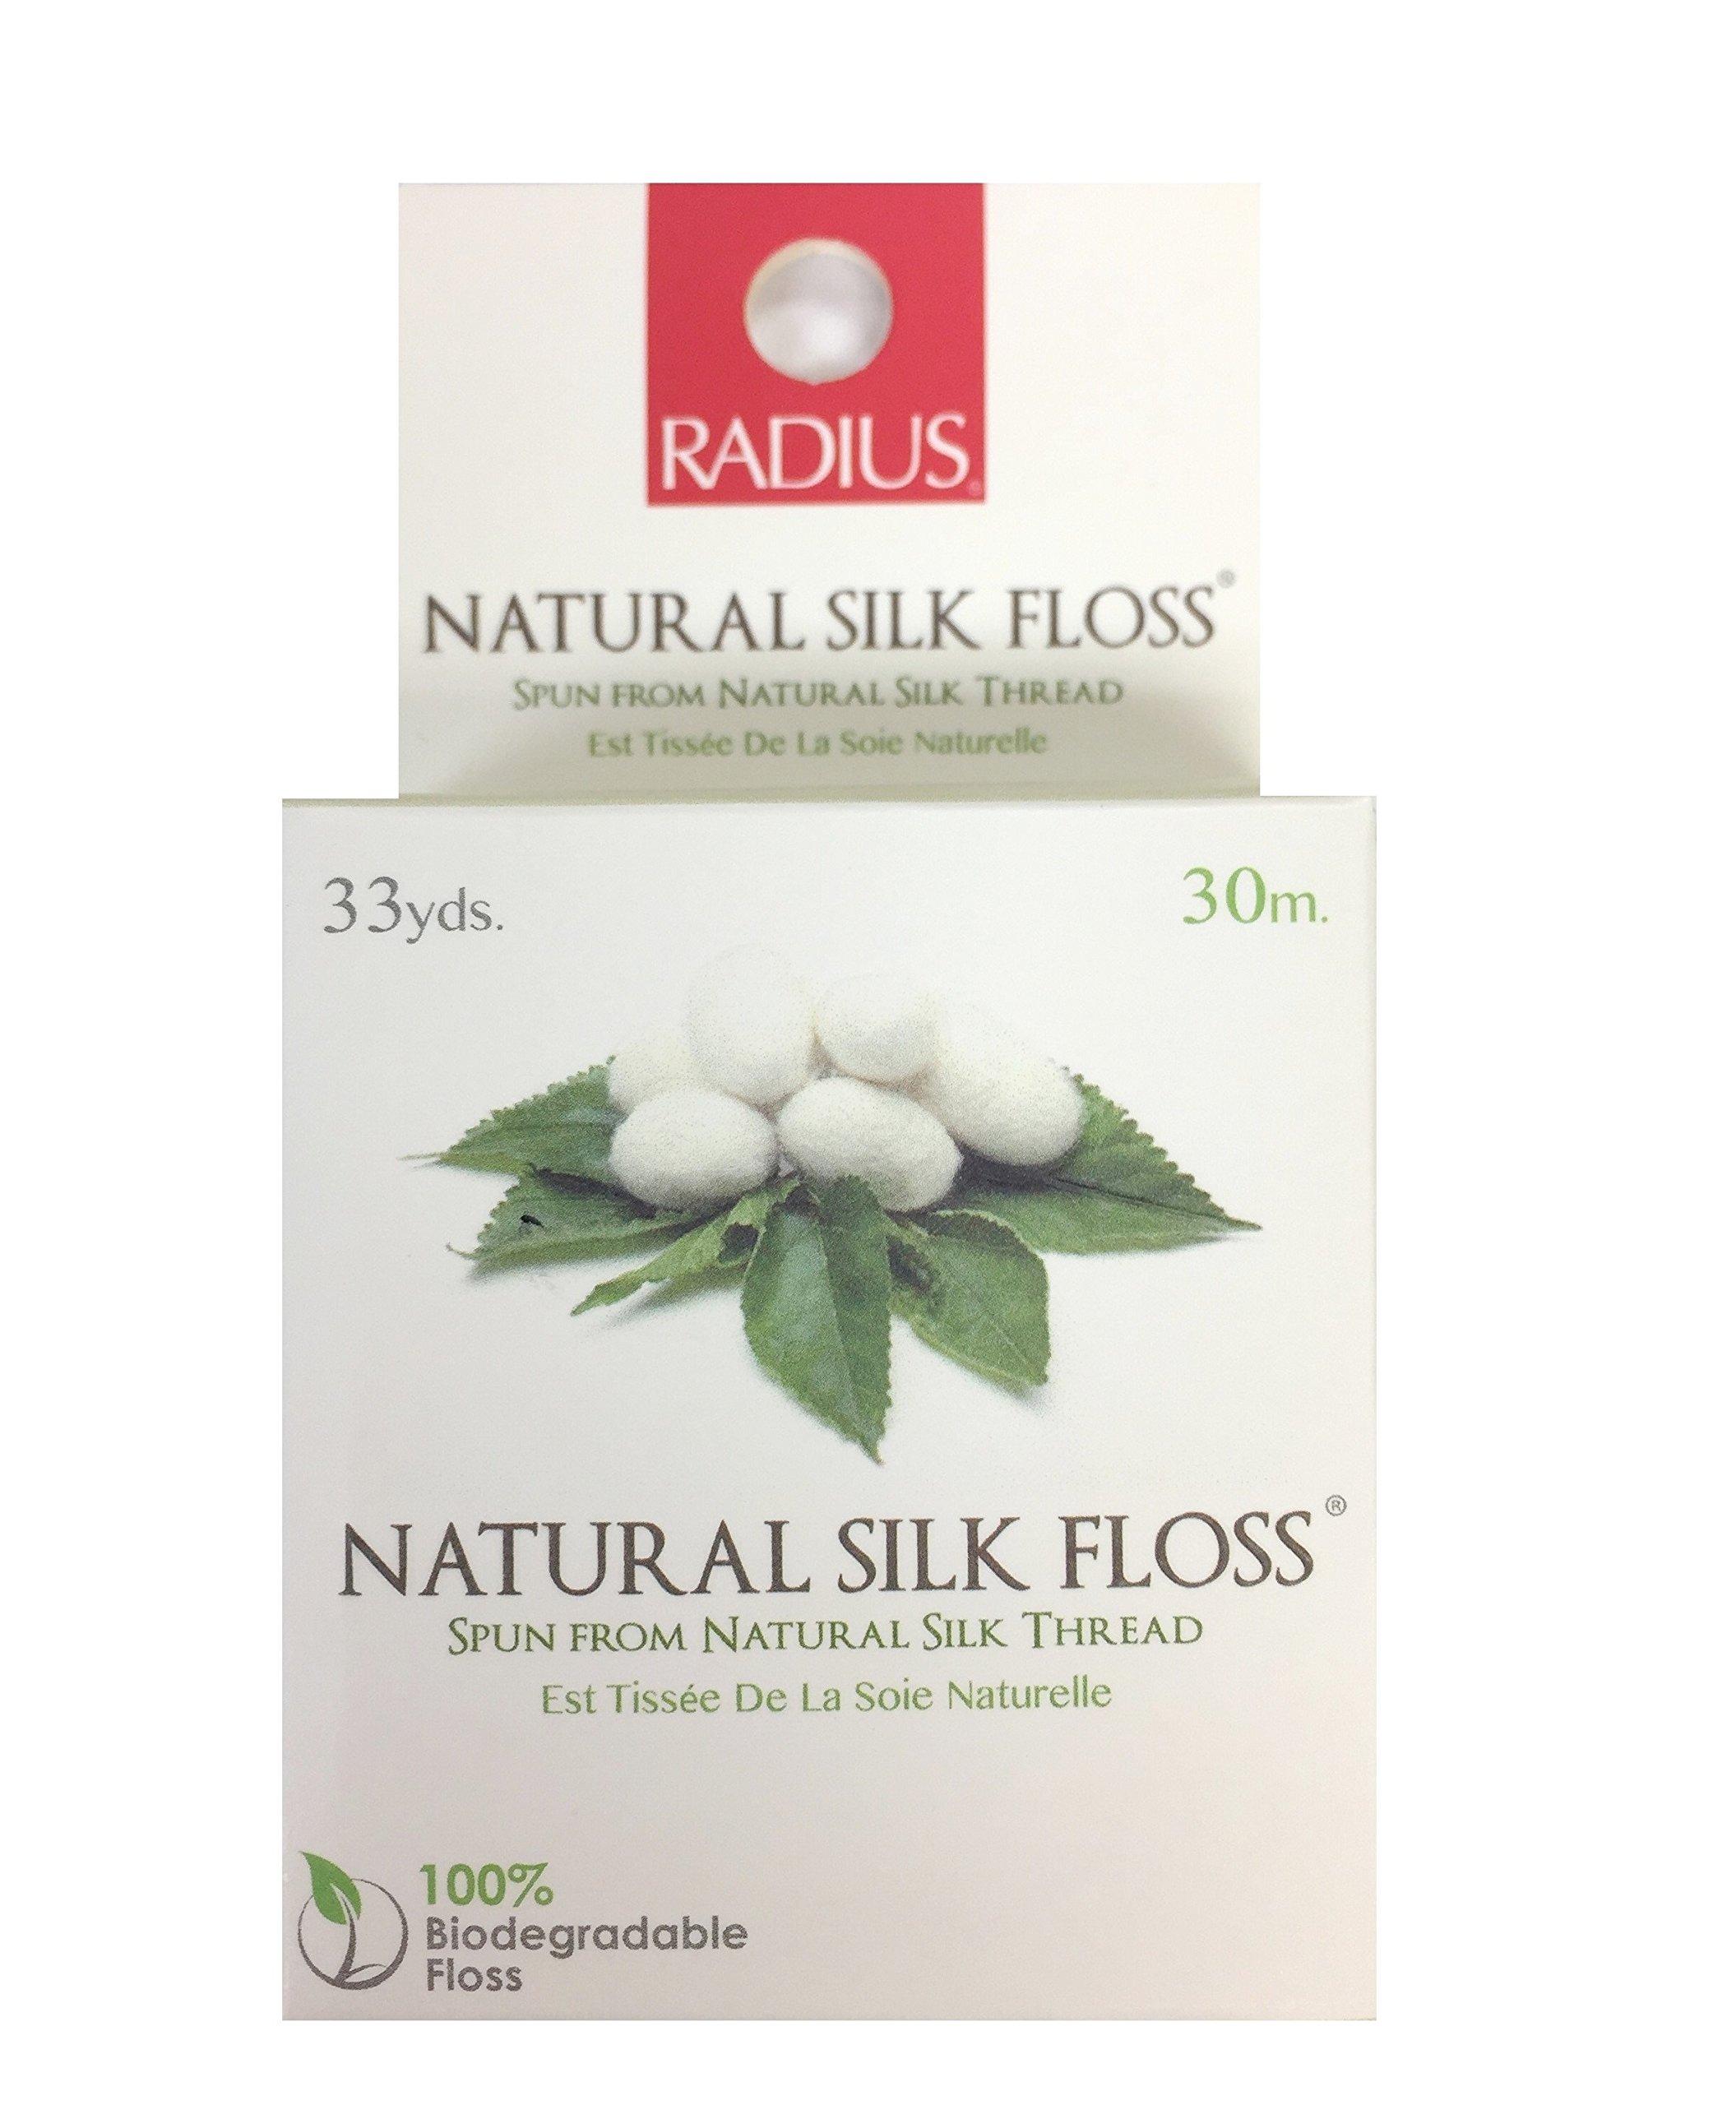 Radius Dental Floss Natural Silk Floss 33 yards (a) - 2pc